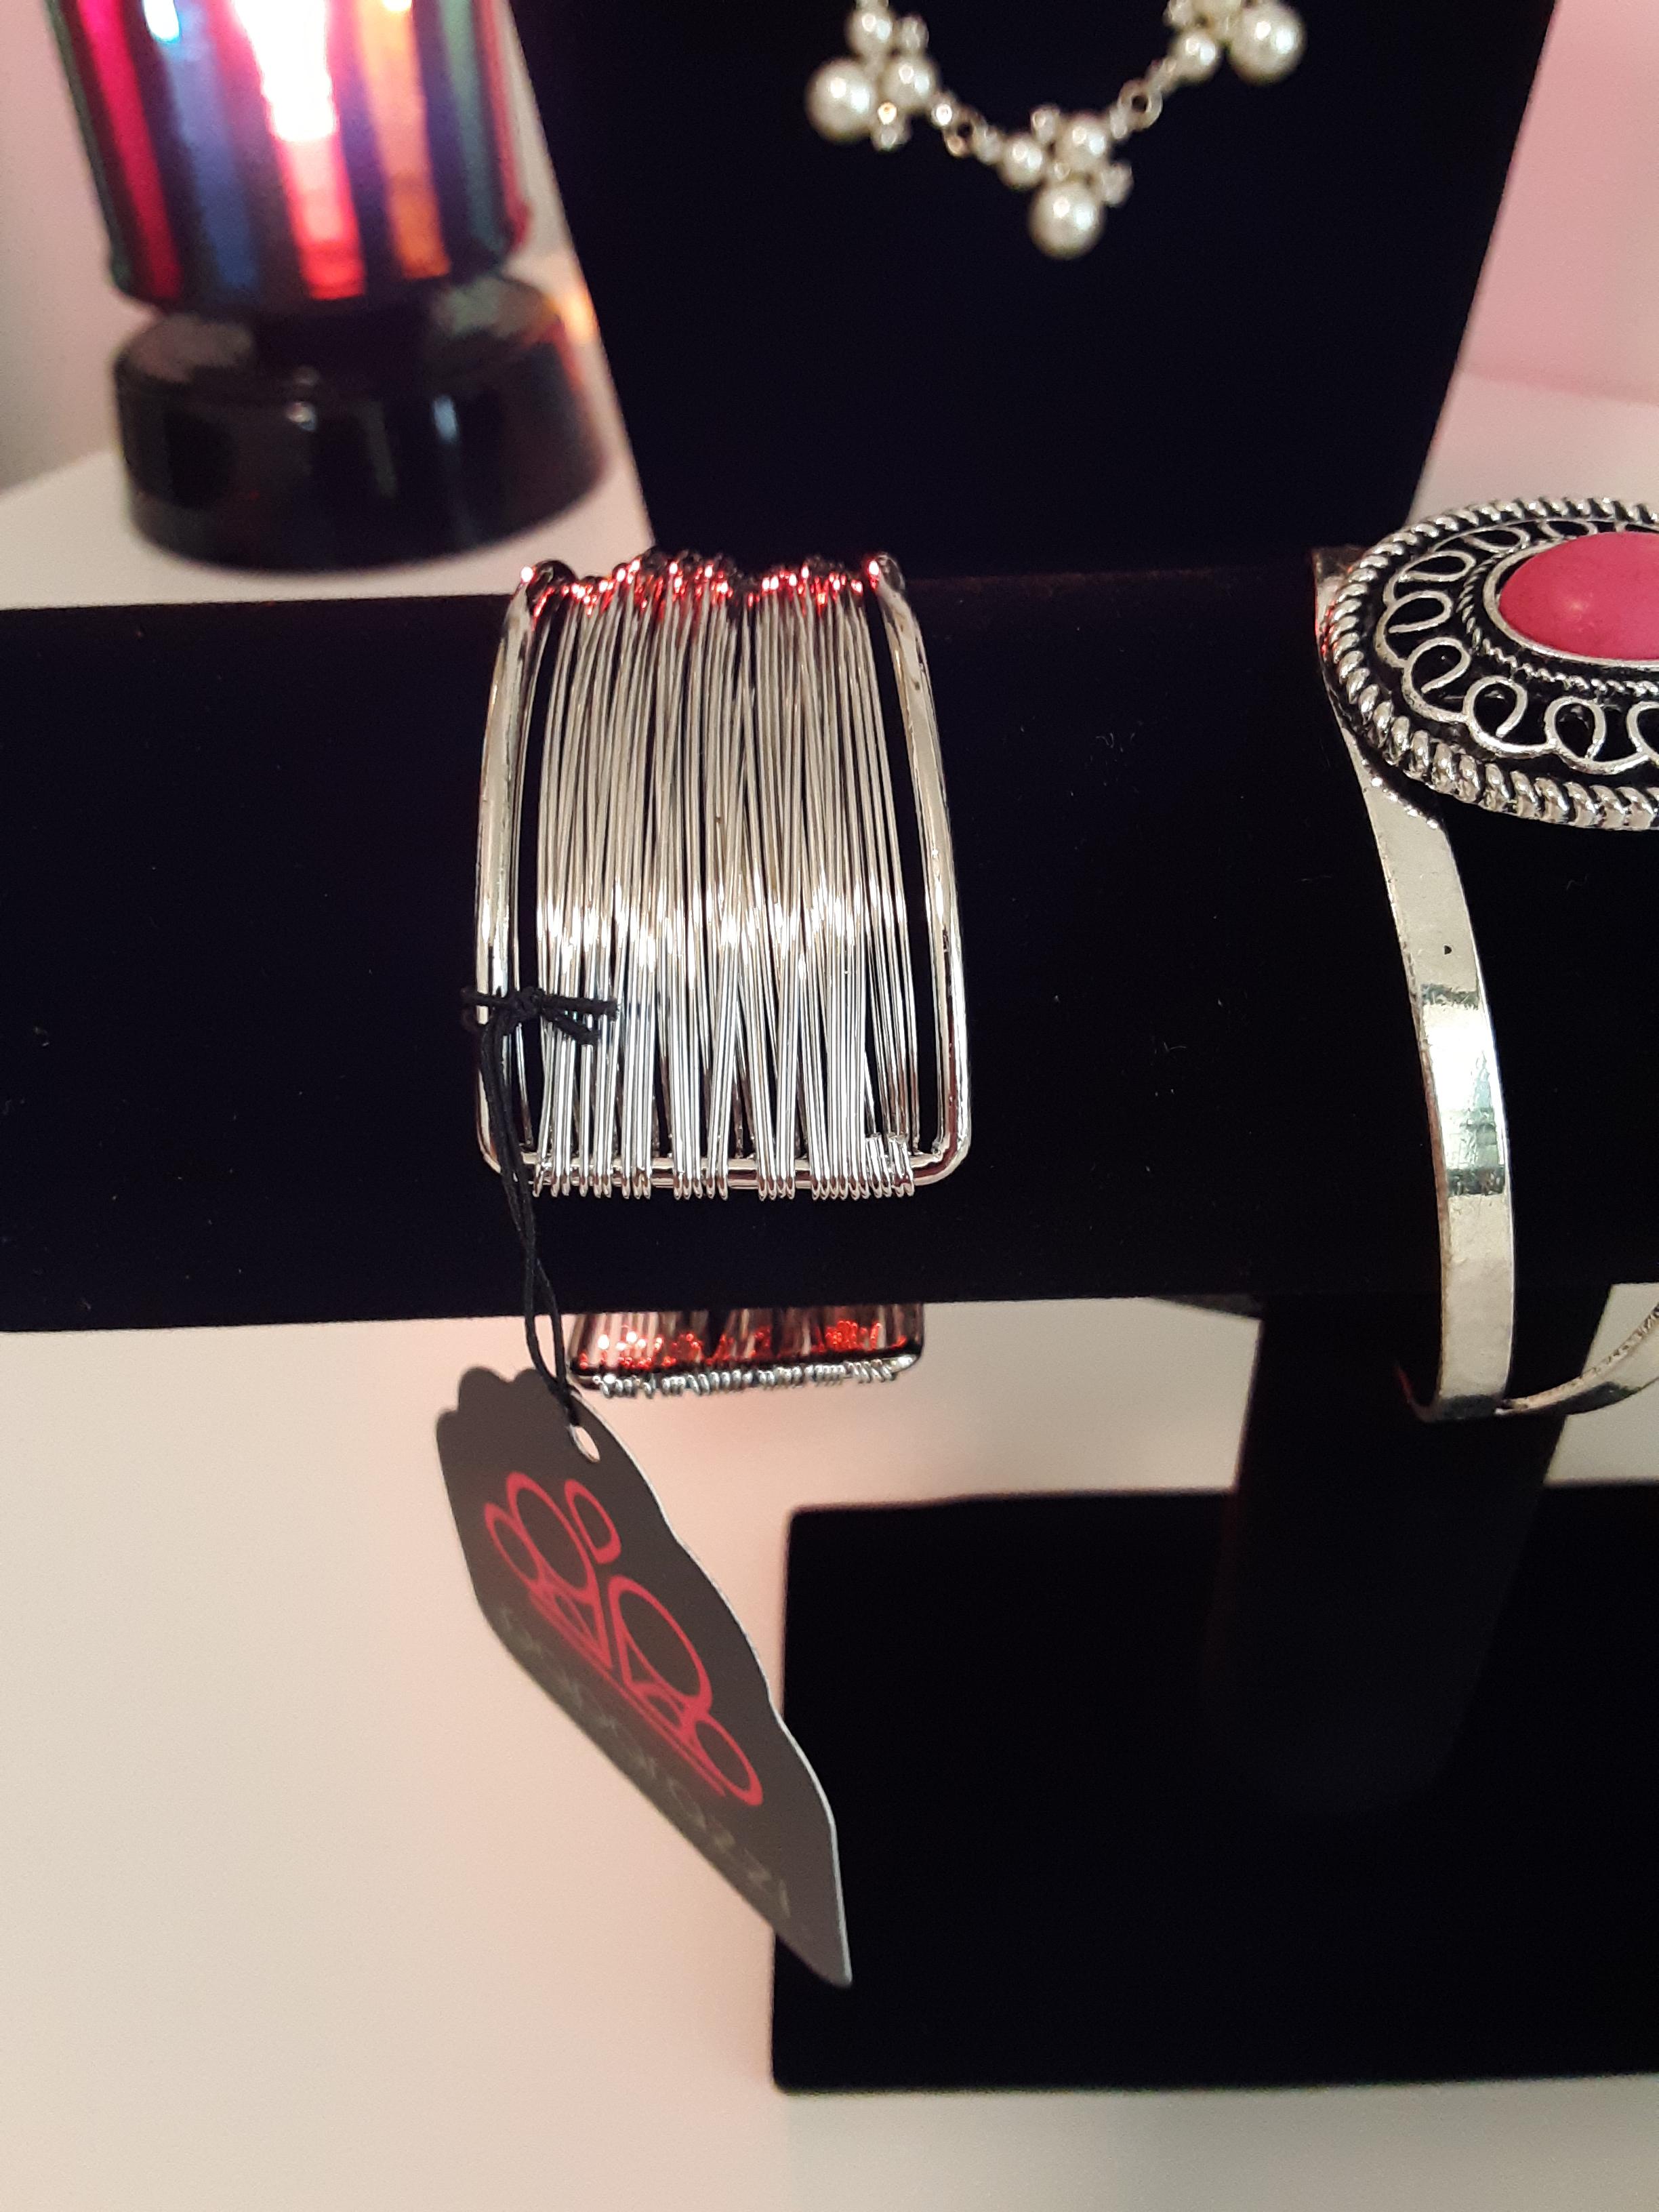 2 Paparazzi Cuff Bracelets $5.00 each from Jfay's Showroom